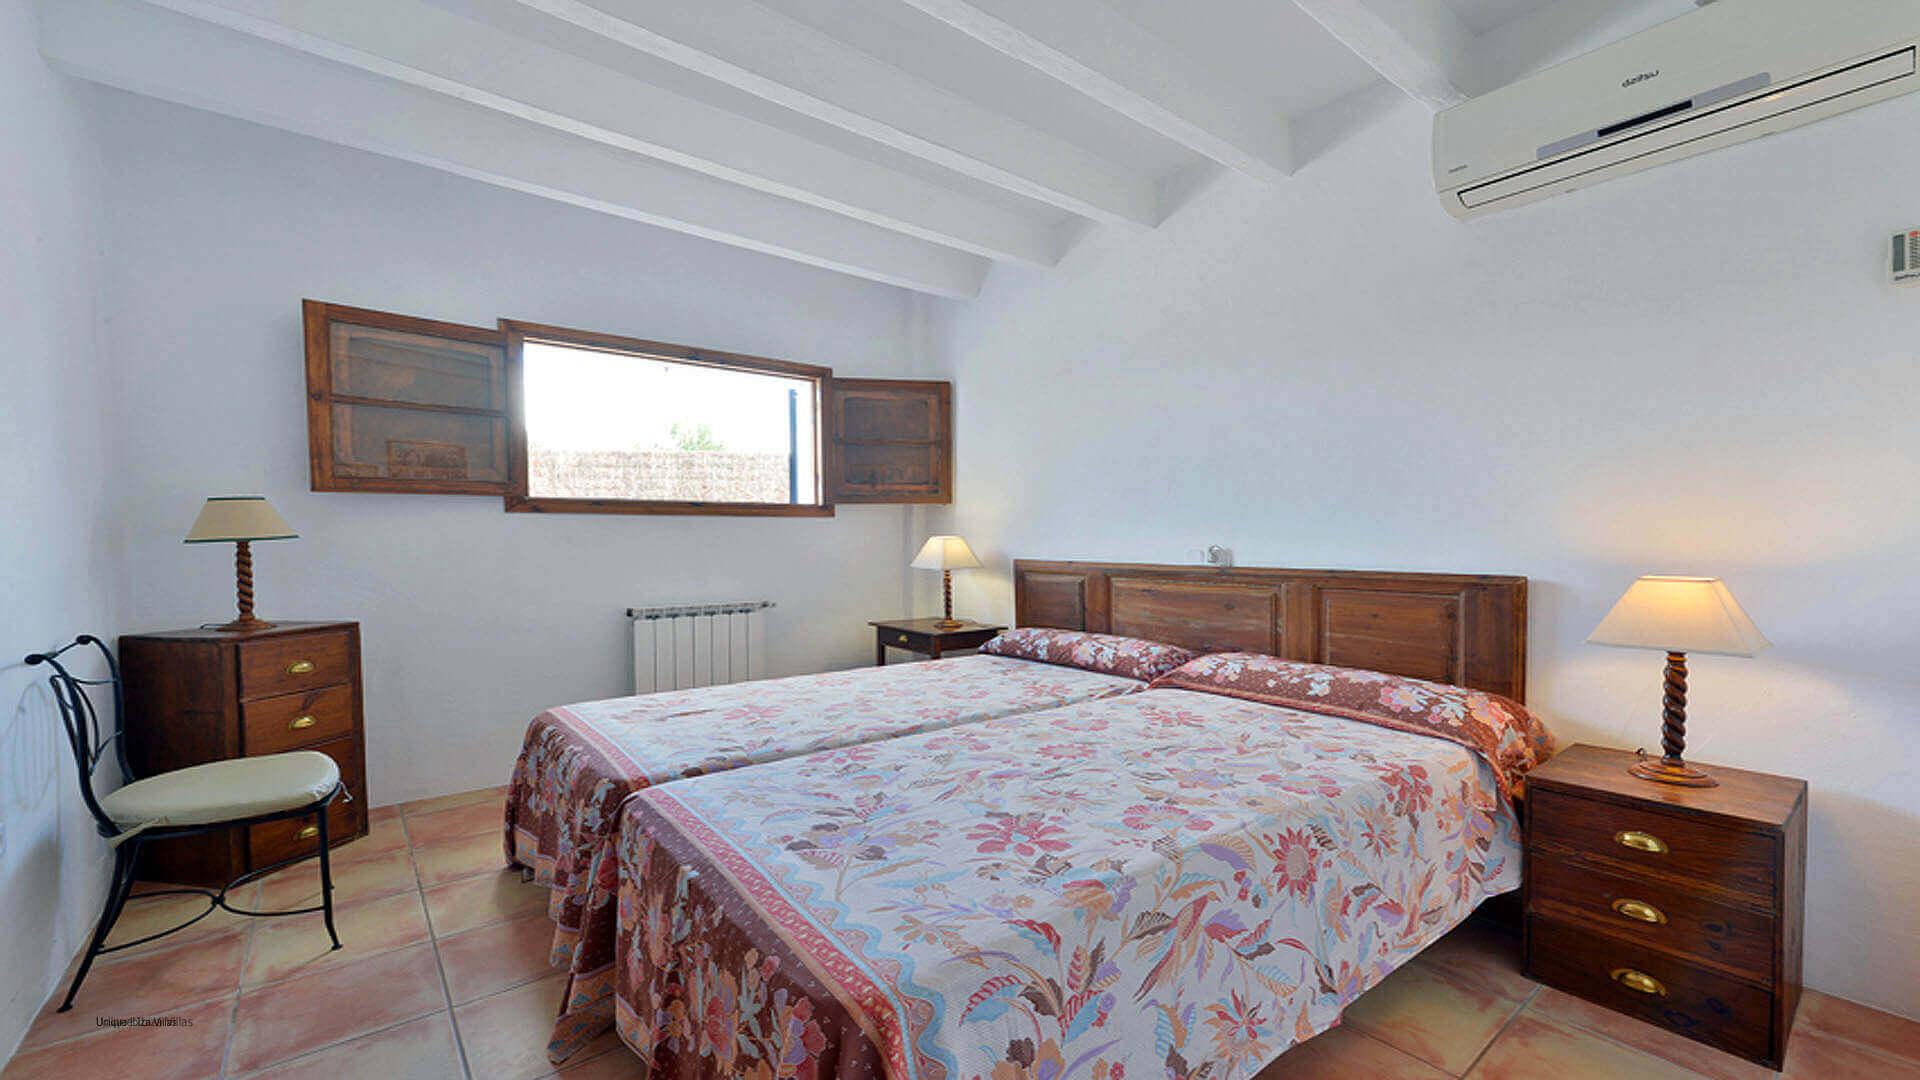 Villa Jaume Dalt Ibiza 20 Bedroom 2